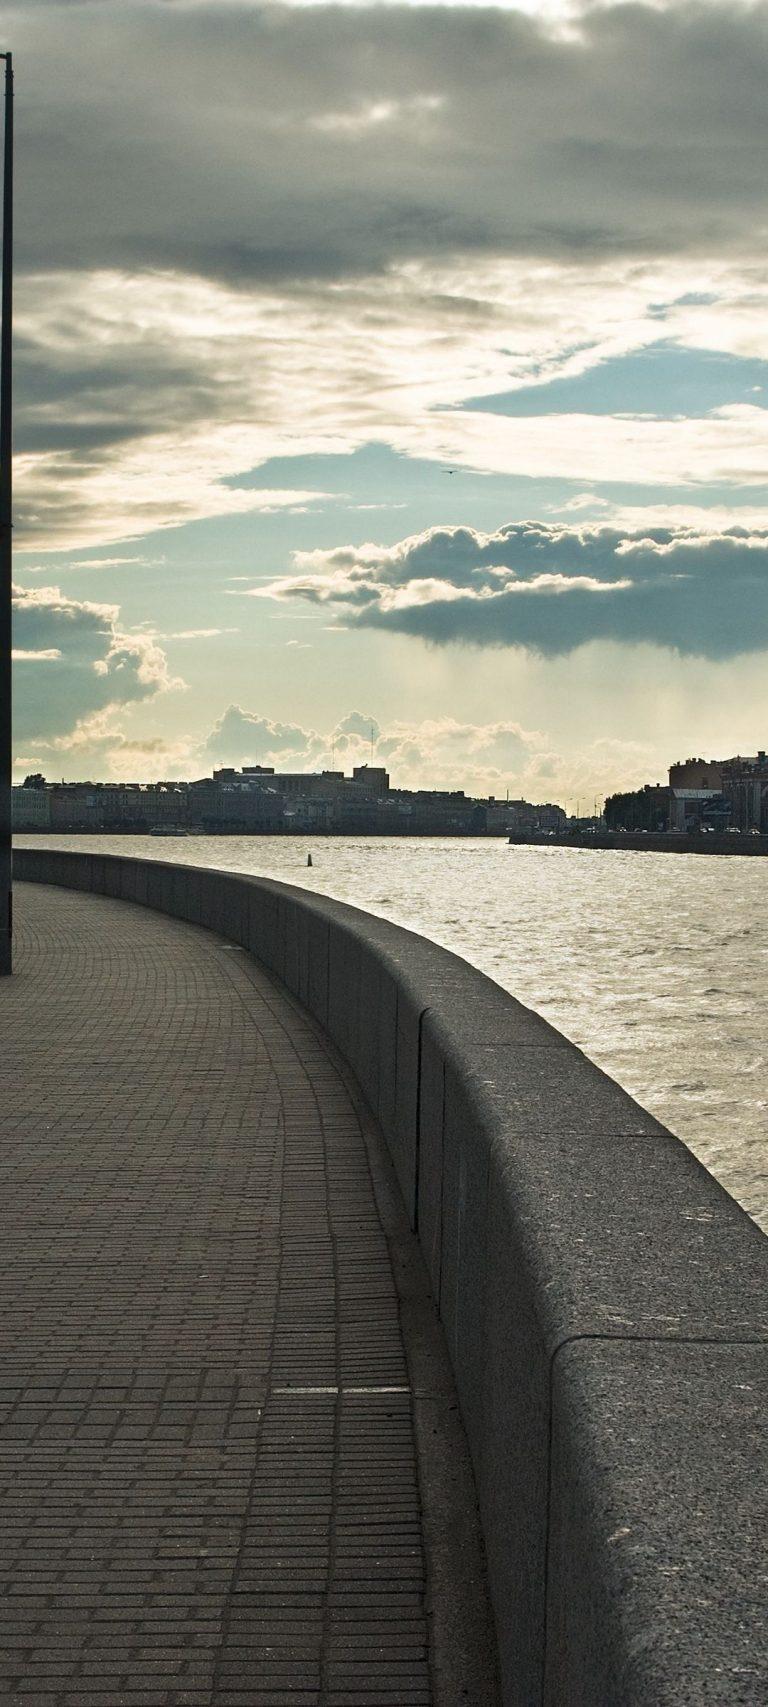 Embankment St Petersburg River 1080x2400 768x1707